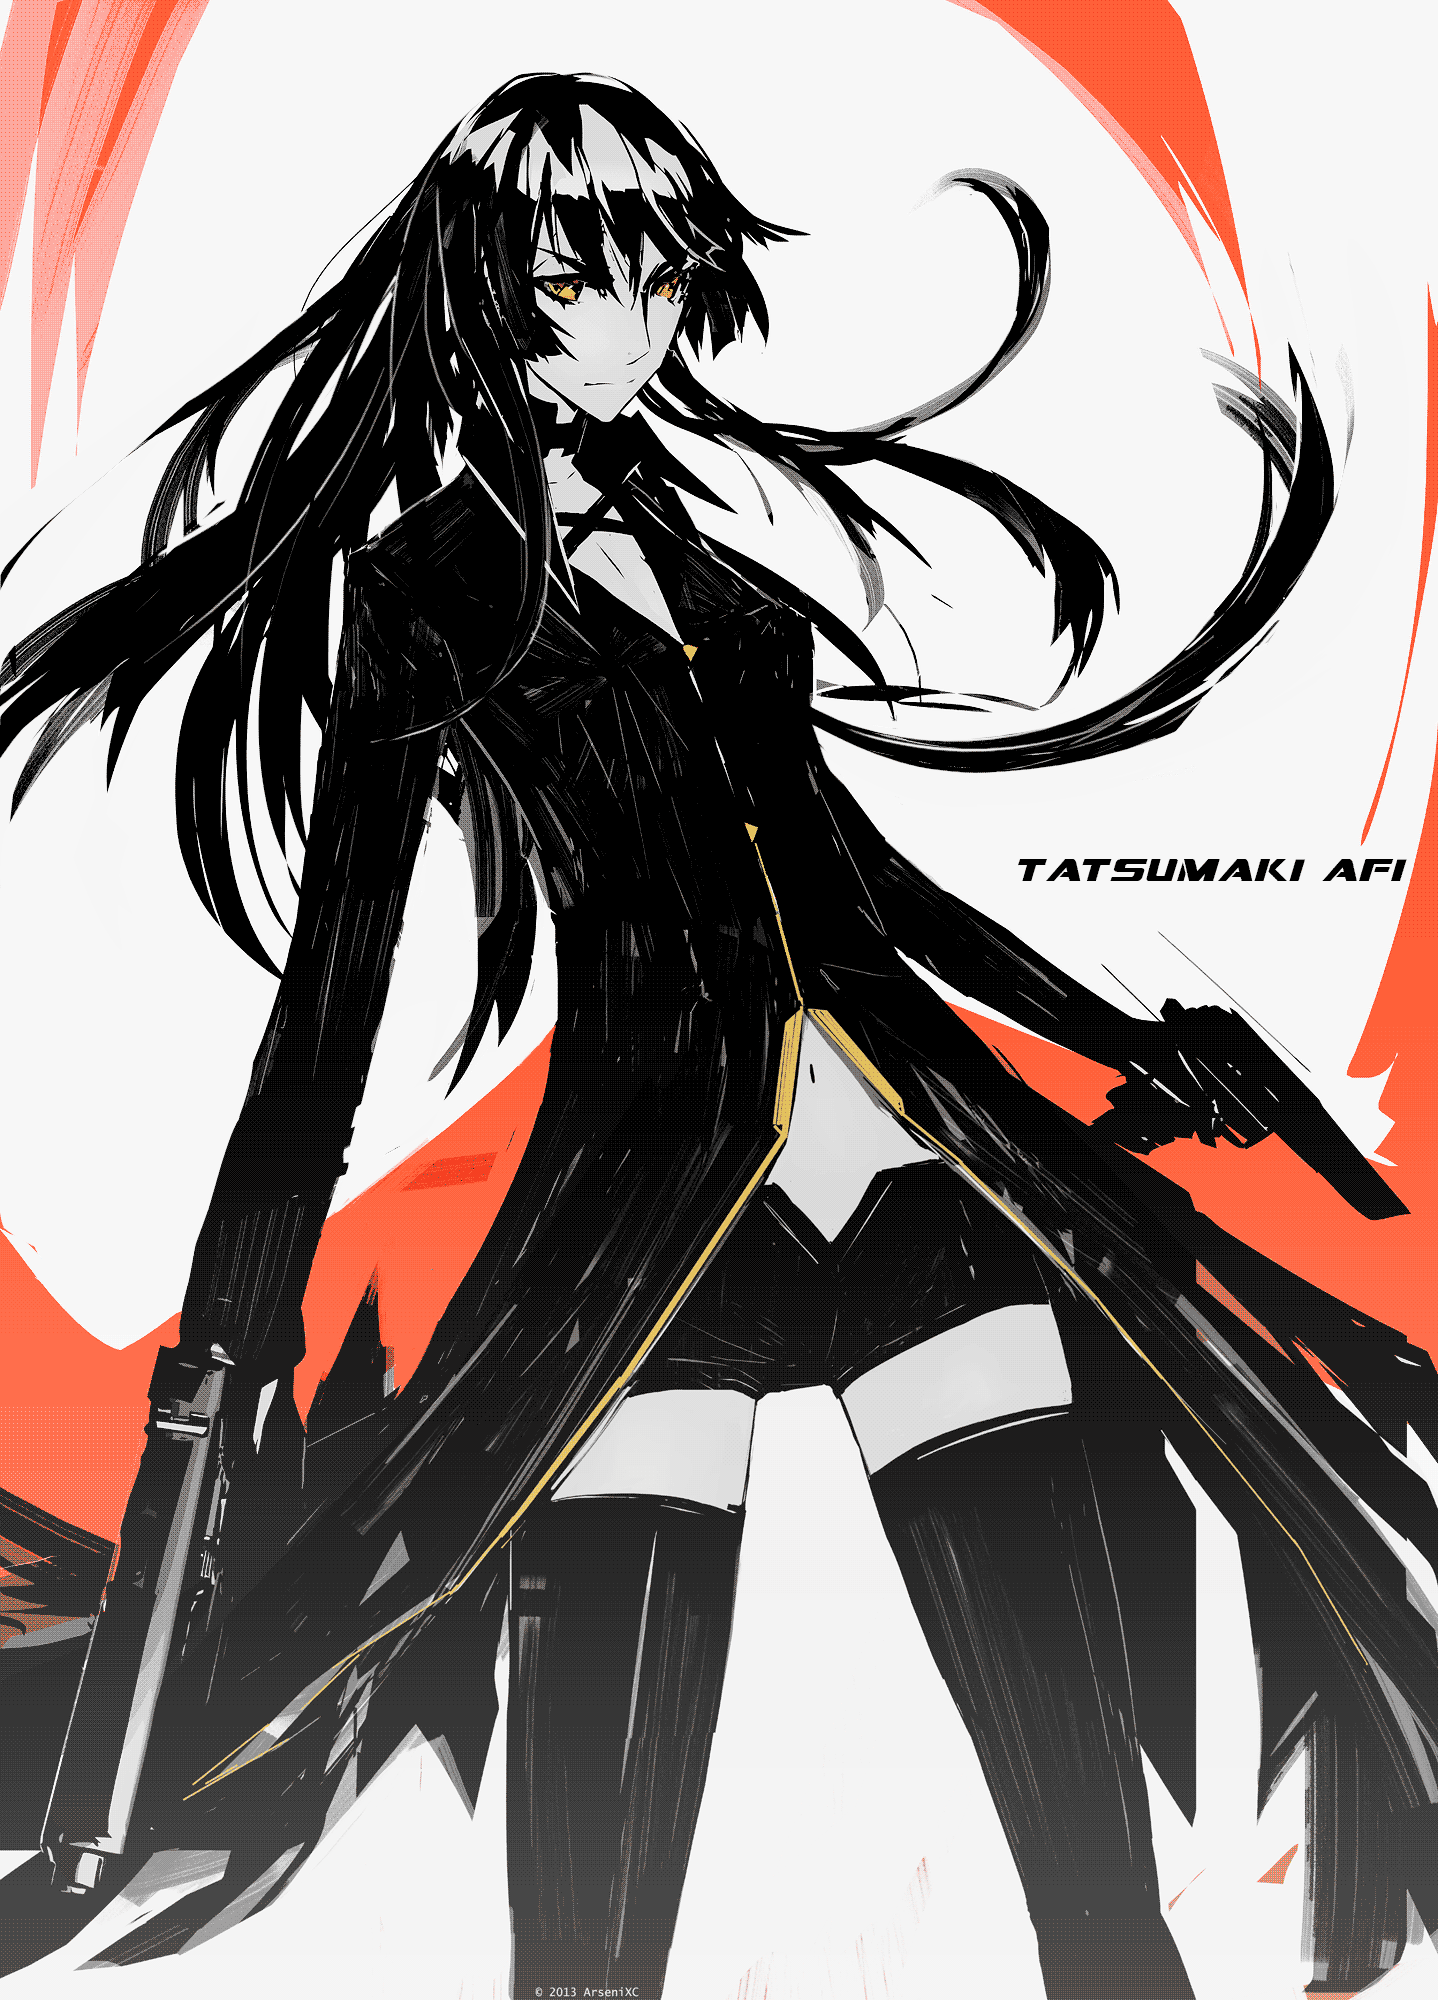 Tatsumaki Afi by arsenixc